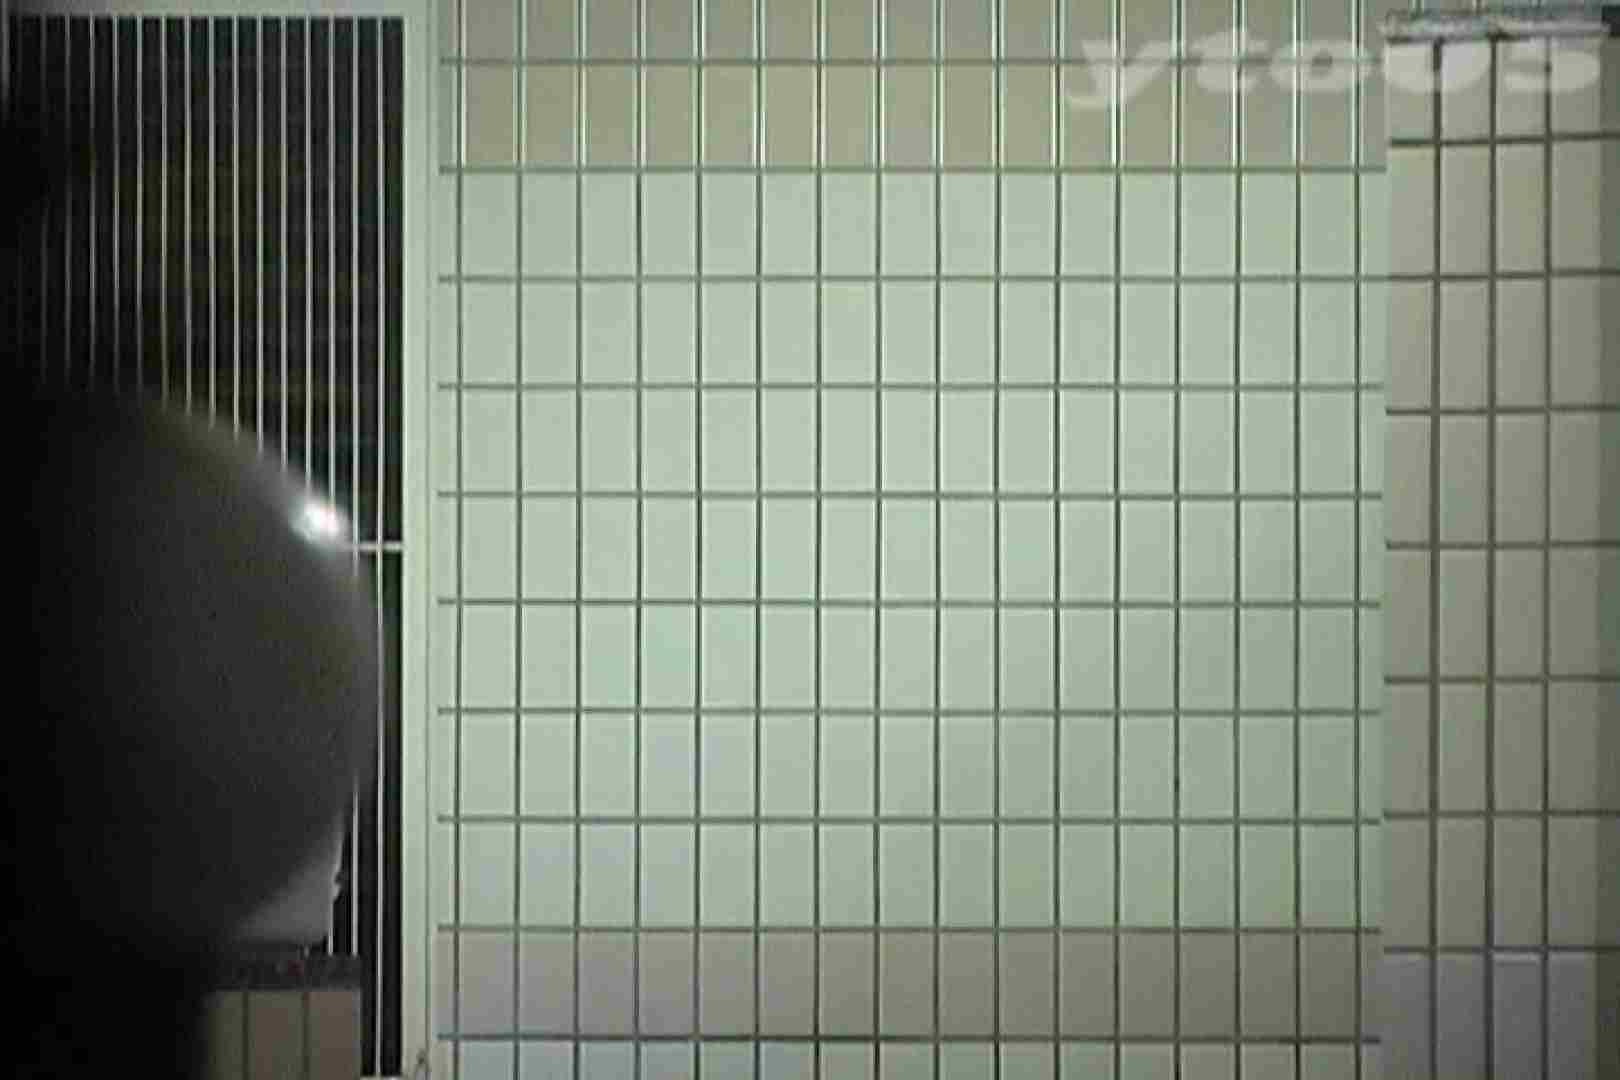 ▲復活限定▲合宿ホテル女風呂盗撮 Vol.31 合宿 濡れ場動画紹介 85pic 11